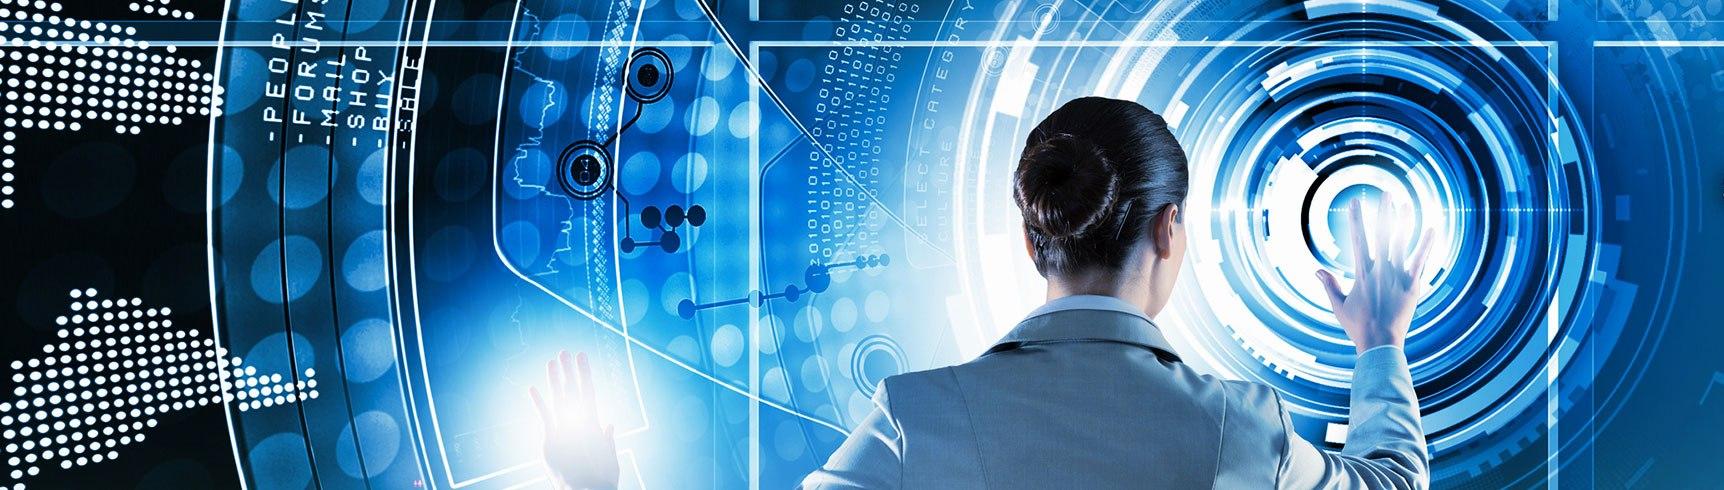 Normandie_AeroEspace_Ban_Recherche_Technologie_Innovation